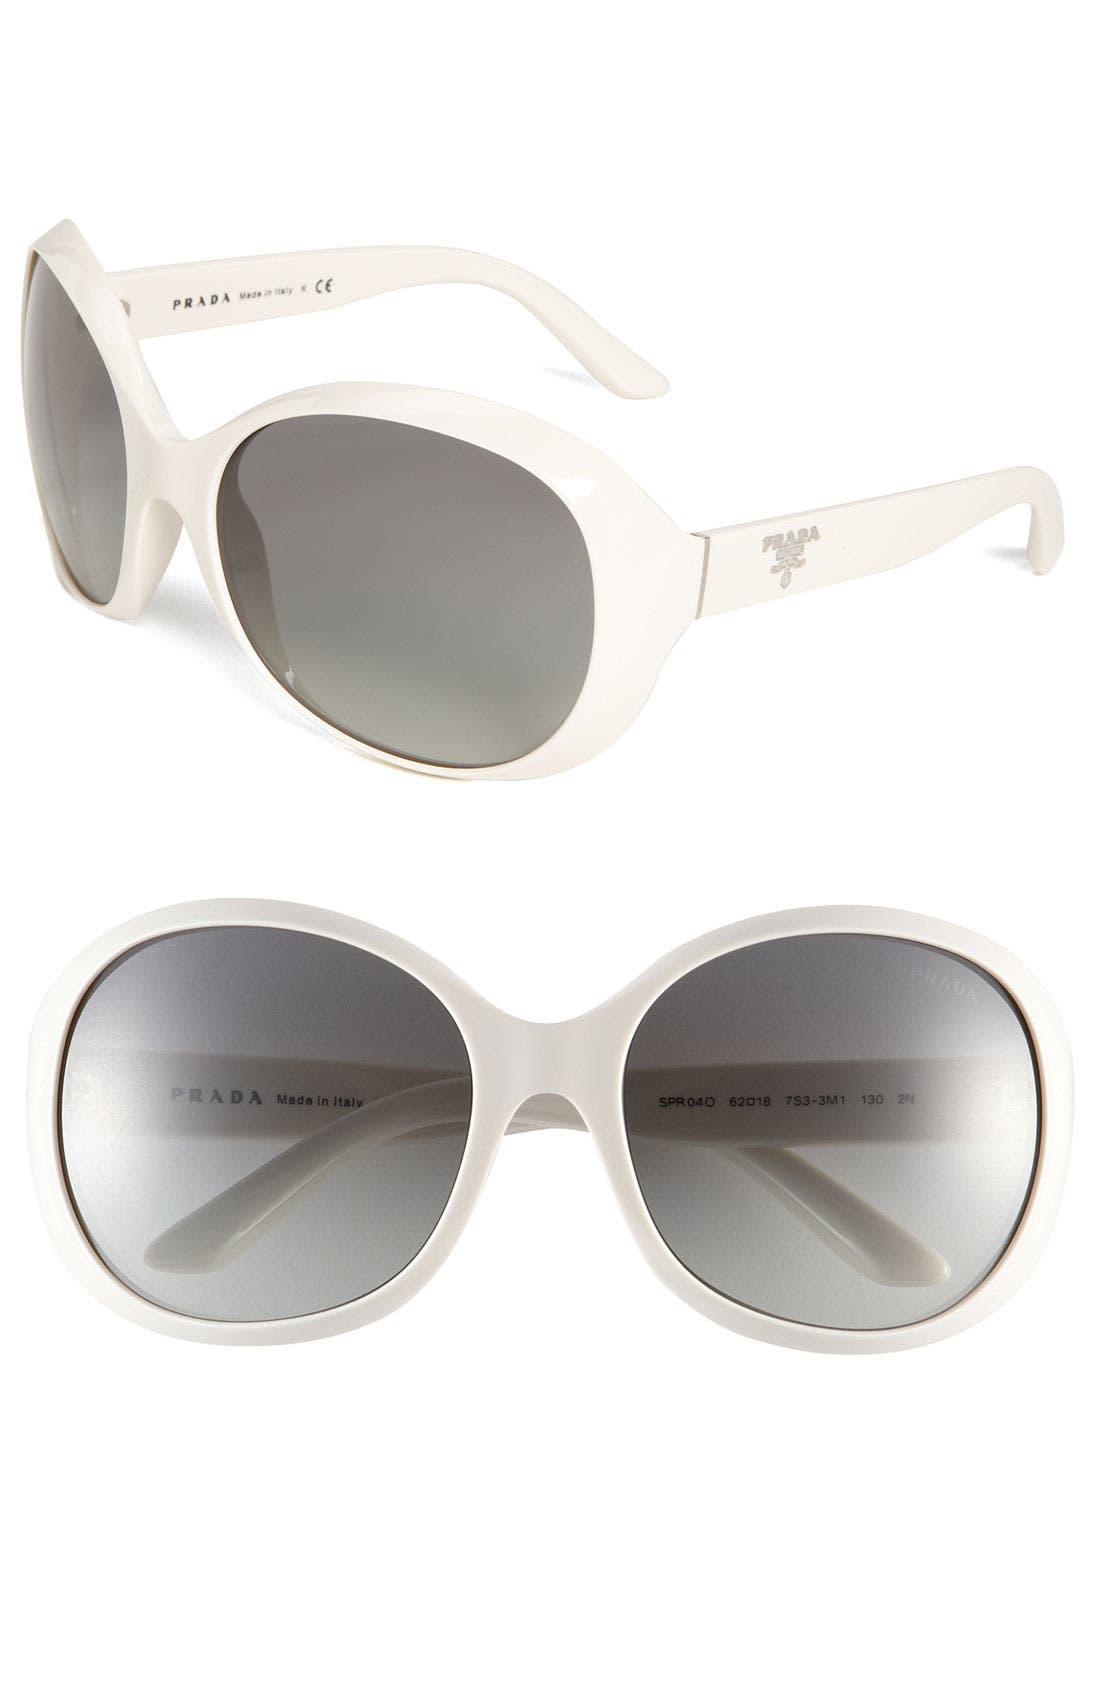 Alternate Image 1 Selected - Prada 60mm Retro Sunglasses